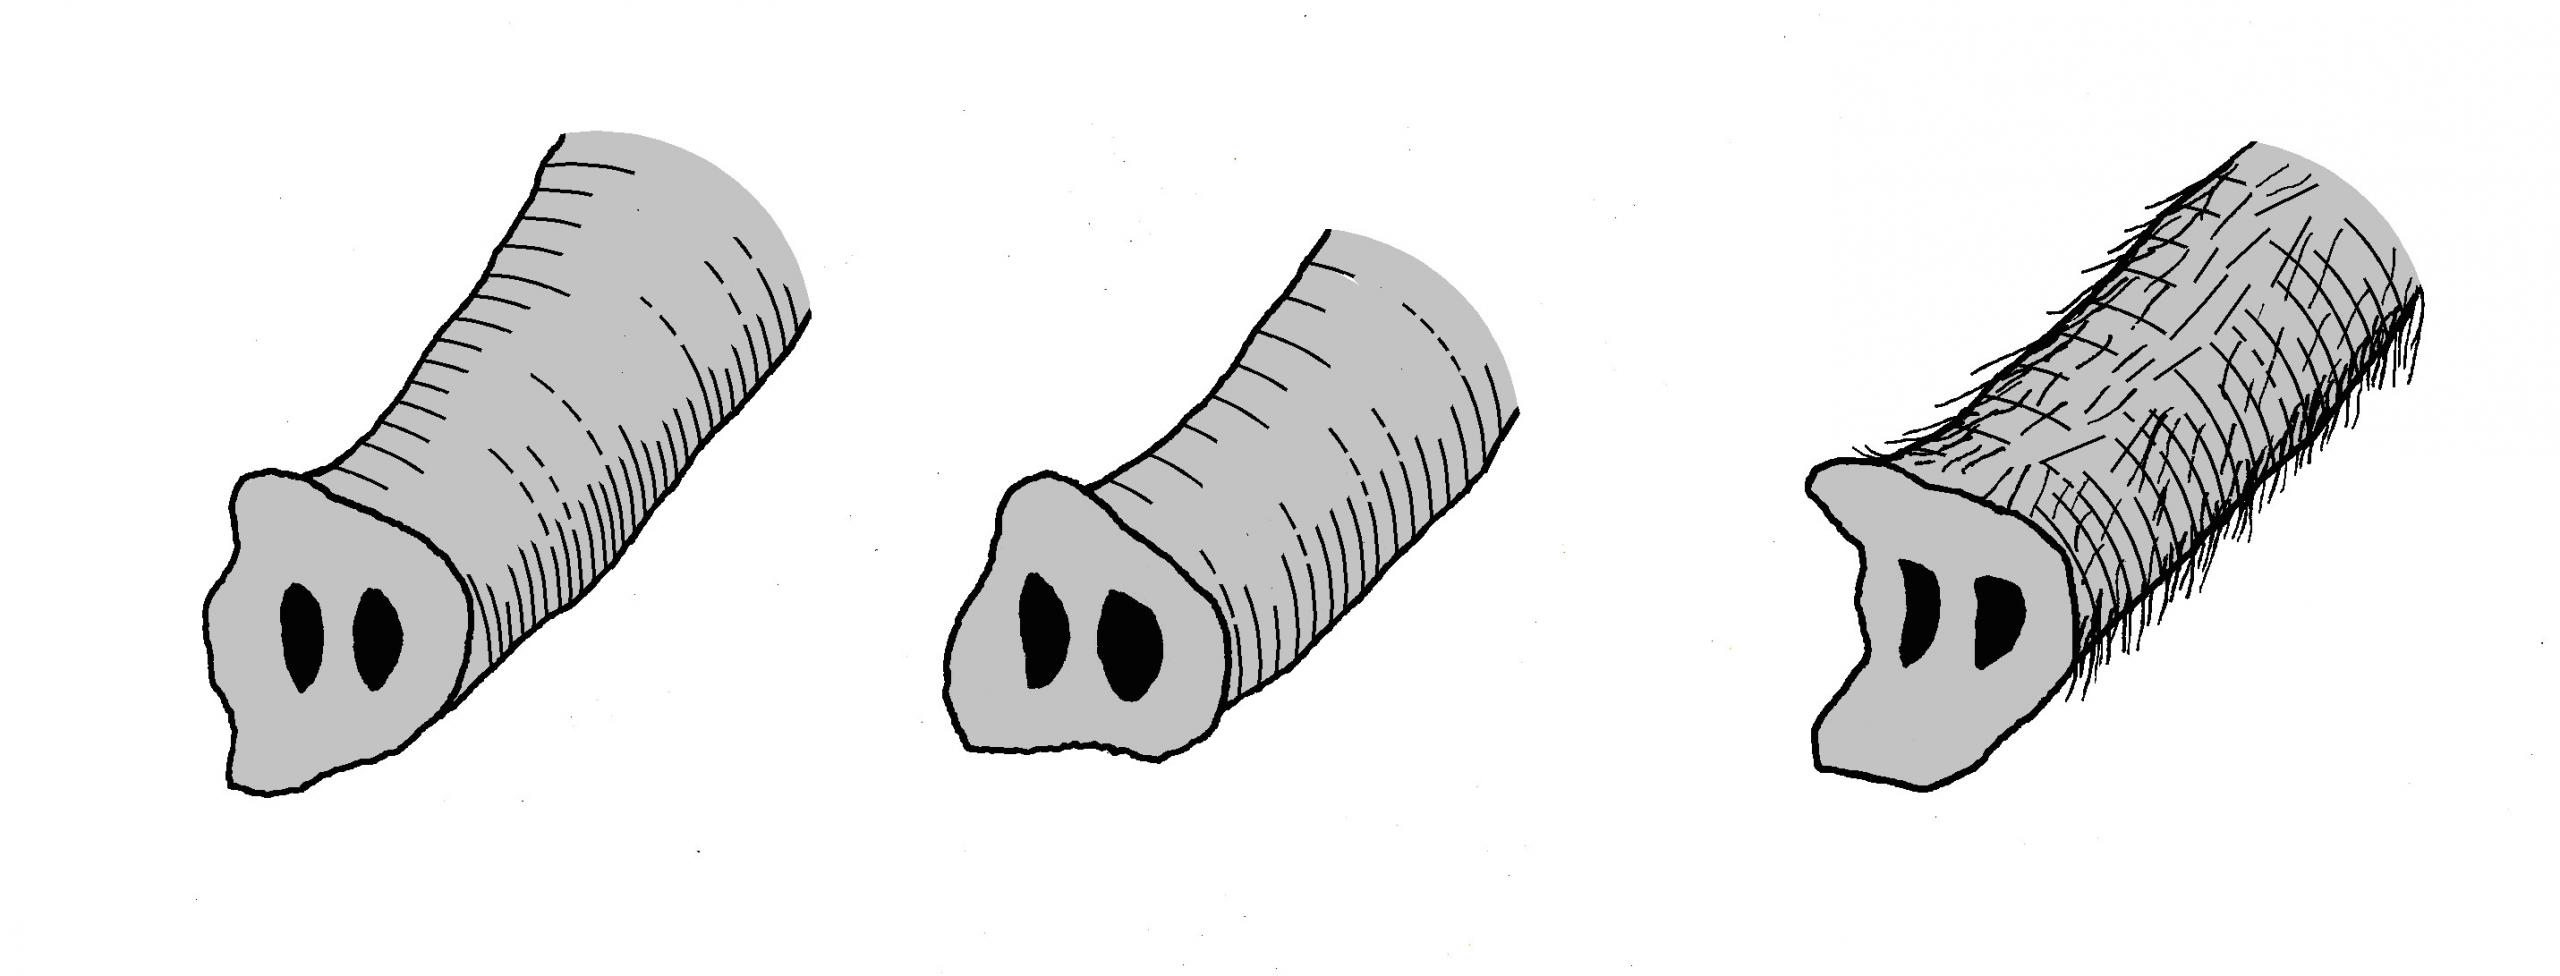 trunks of elephants png